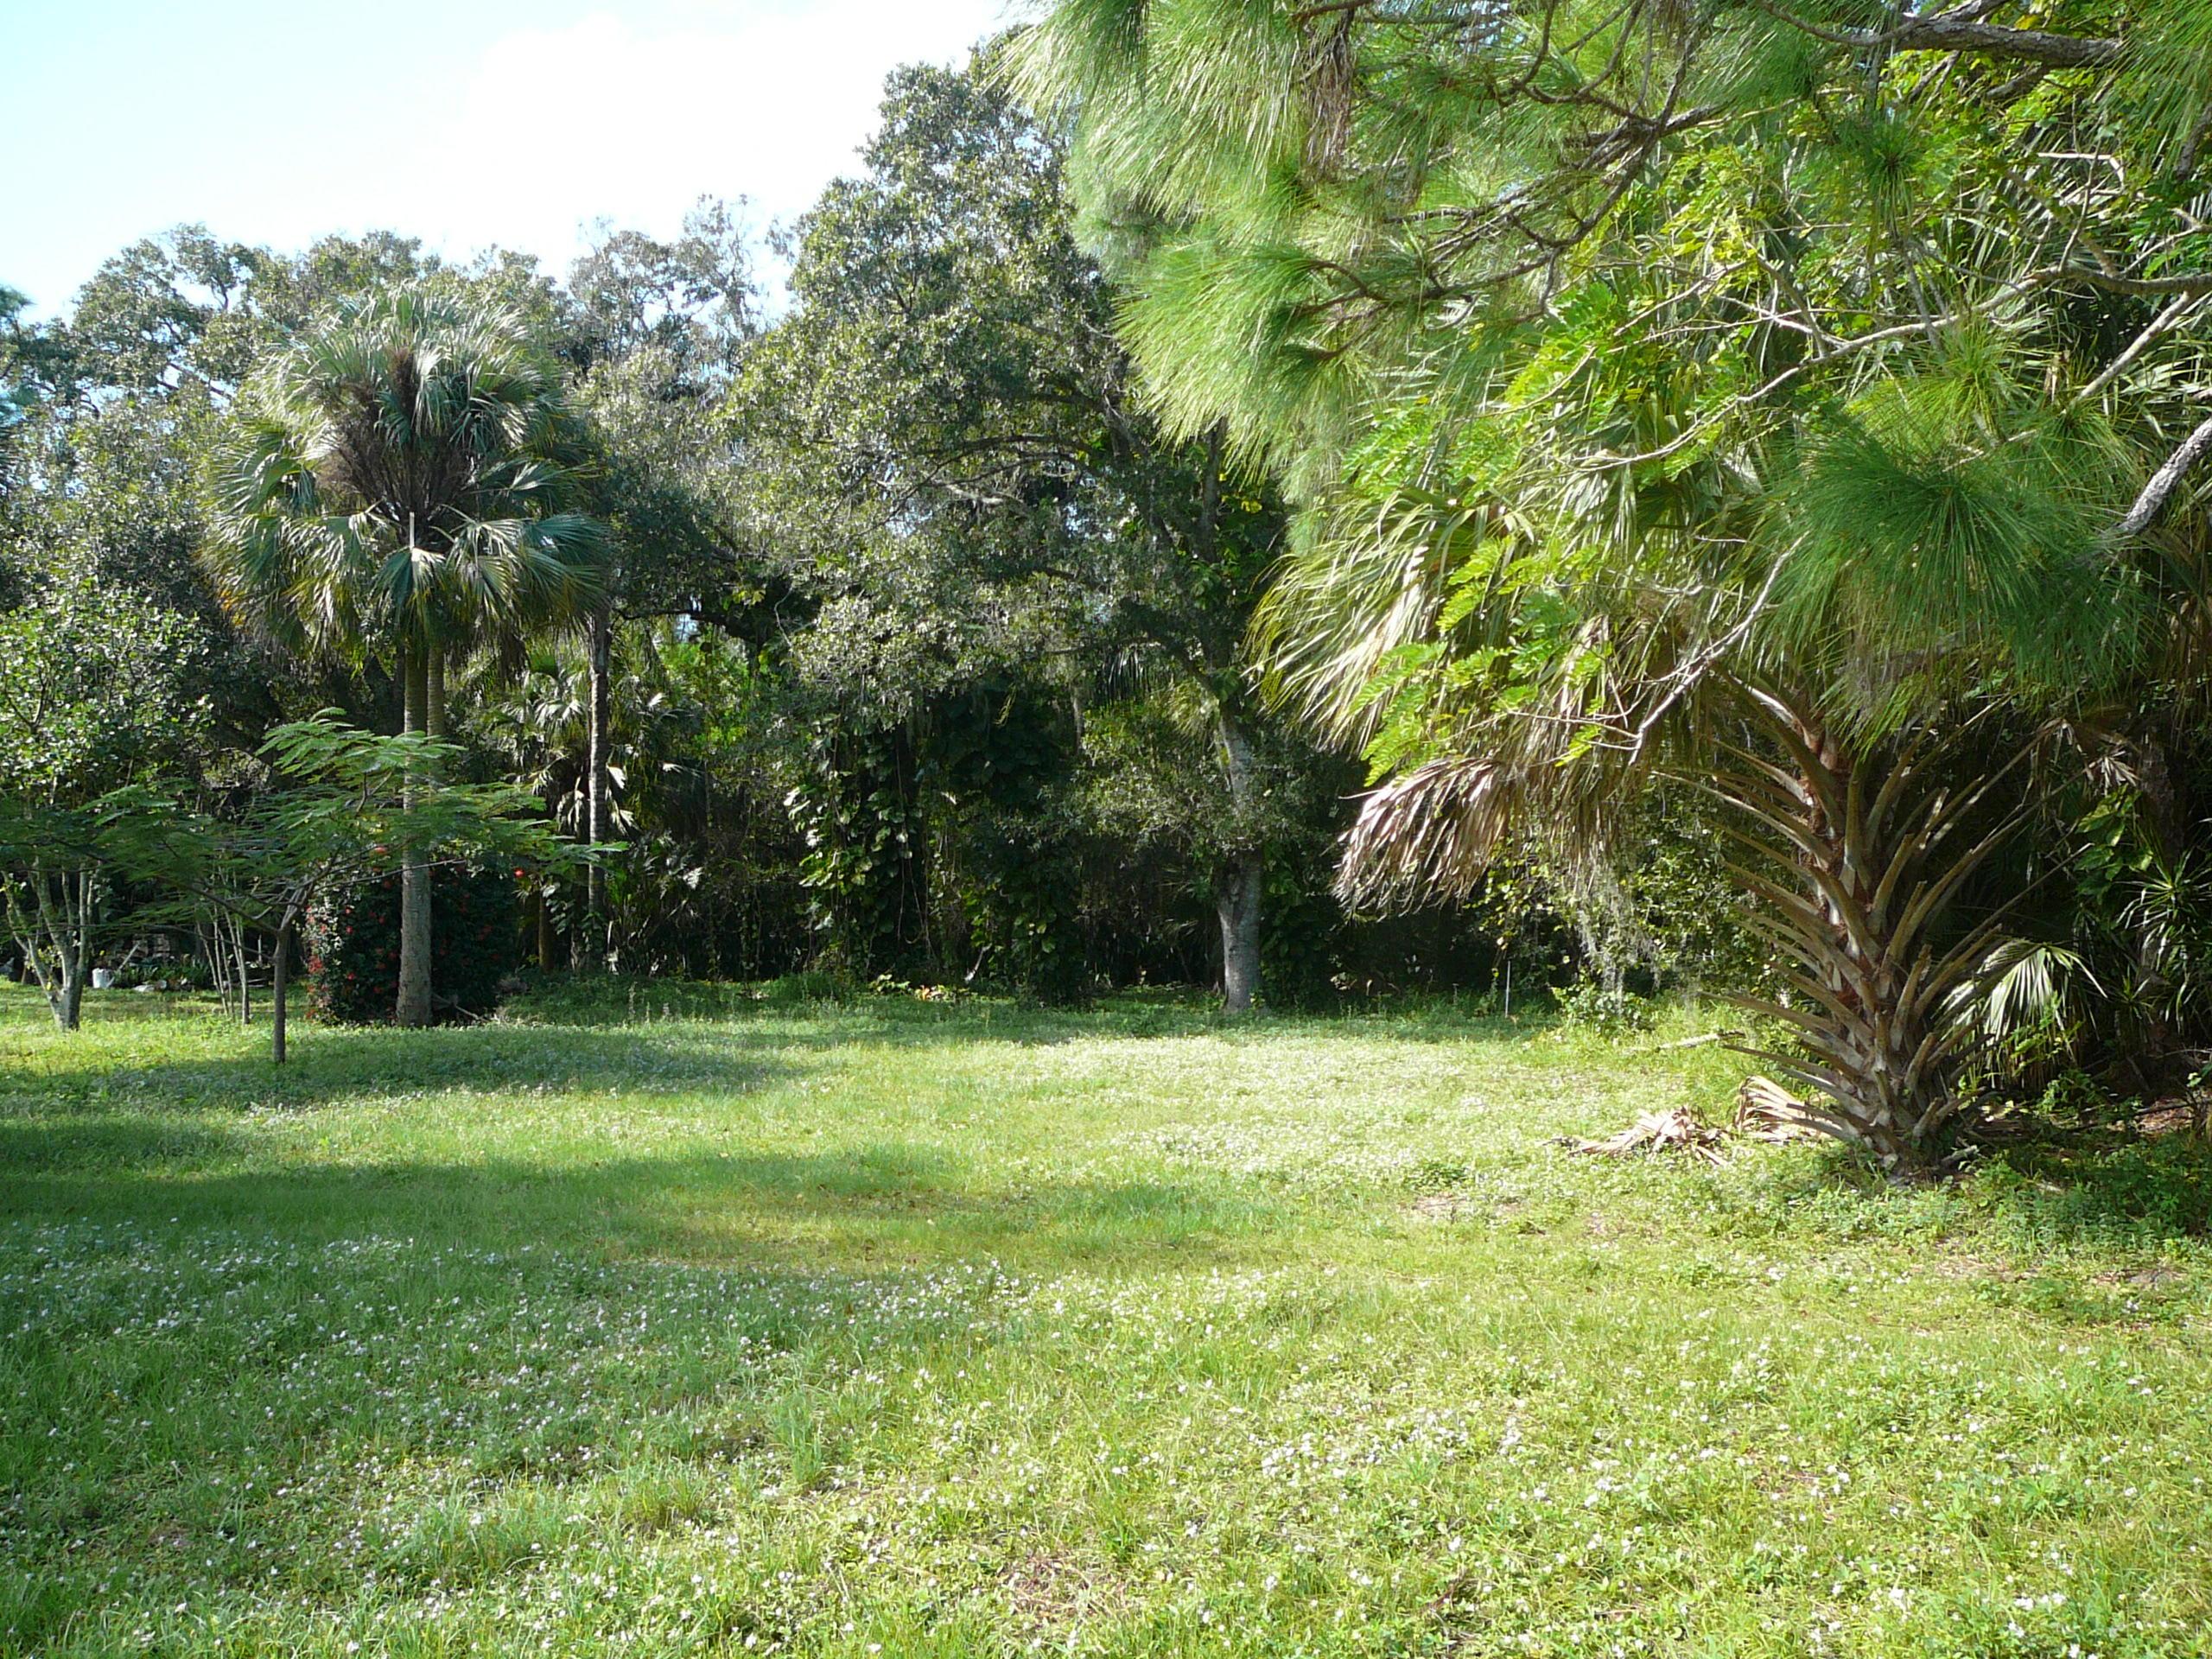 0000 Forest Place, Fort Pierce, FL 34982